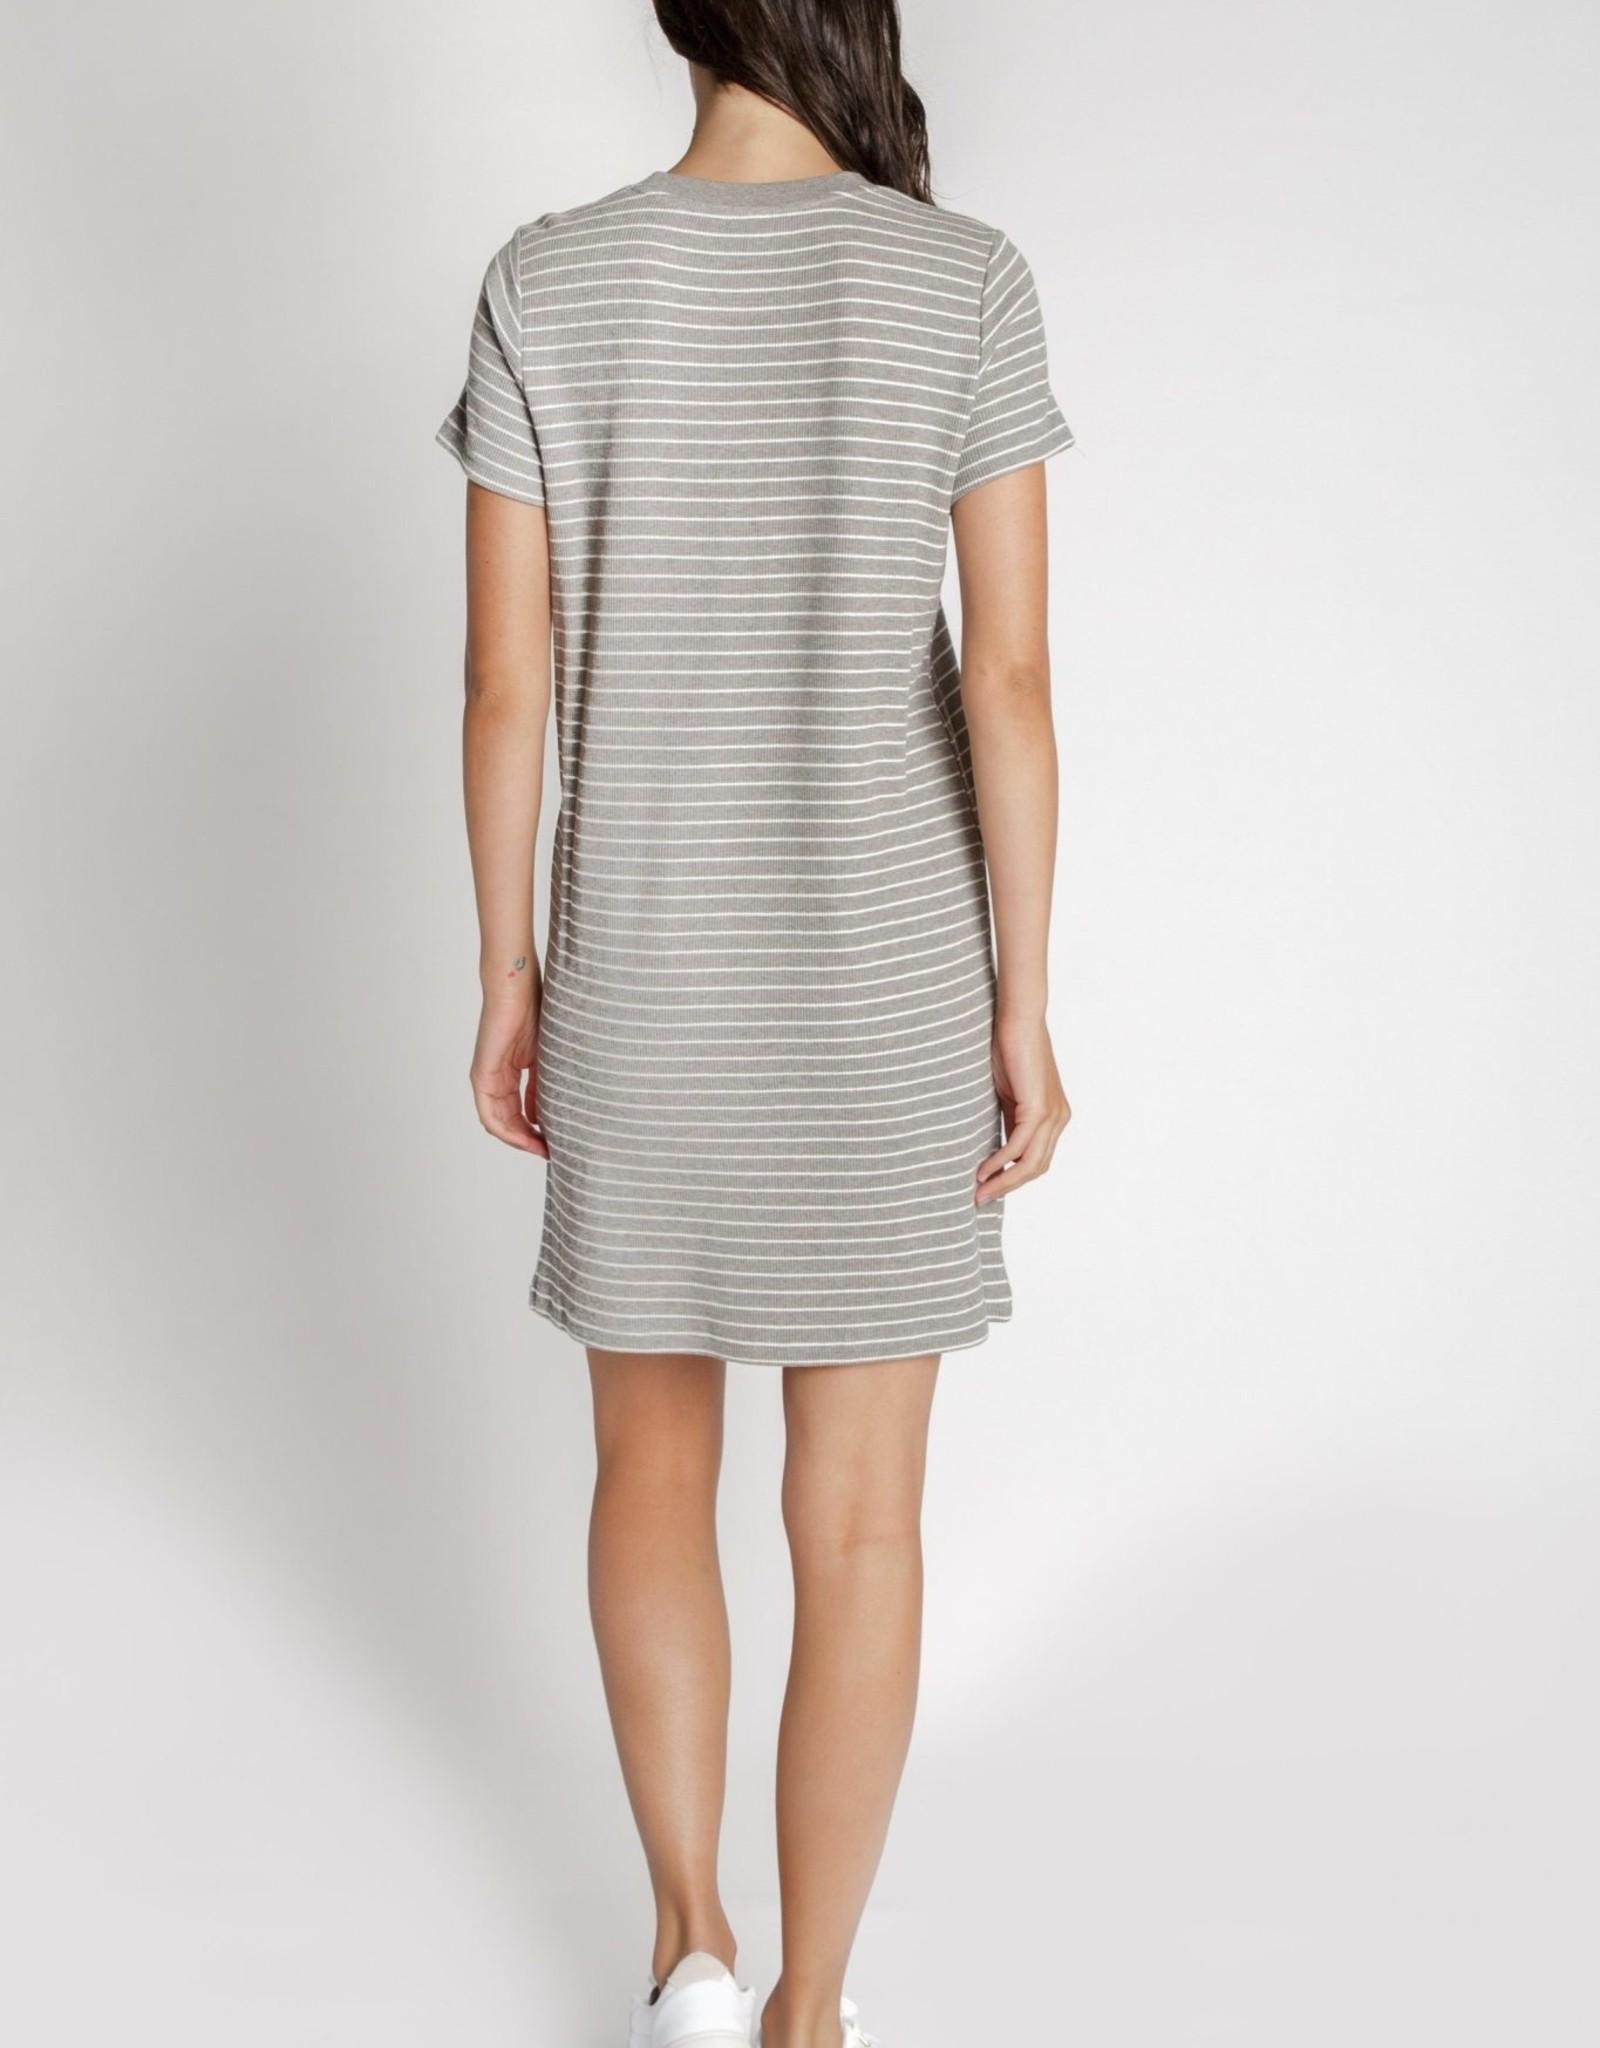 THREAD & SUPPLY Valerian Striped Dress